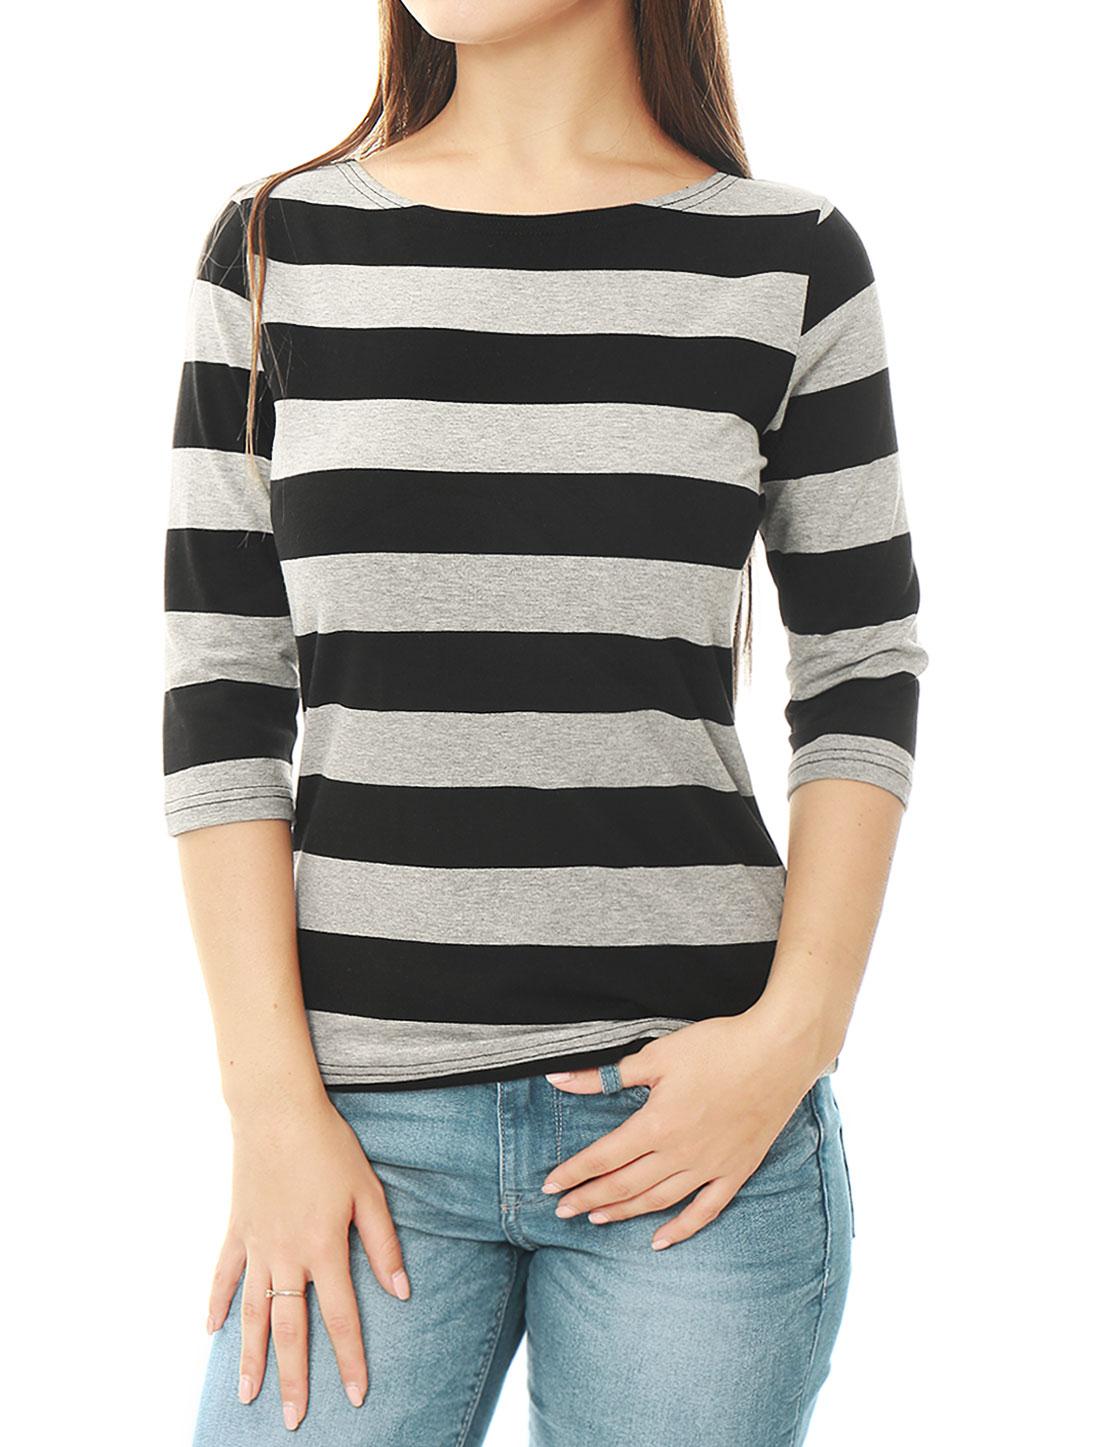 Women Elbow Sleeves Boat Neck Slim Fit Striped Tee Black L